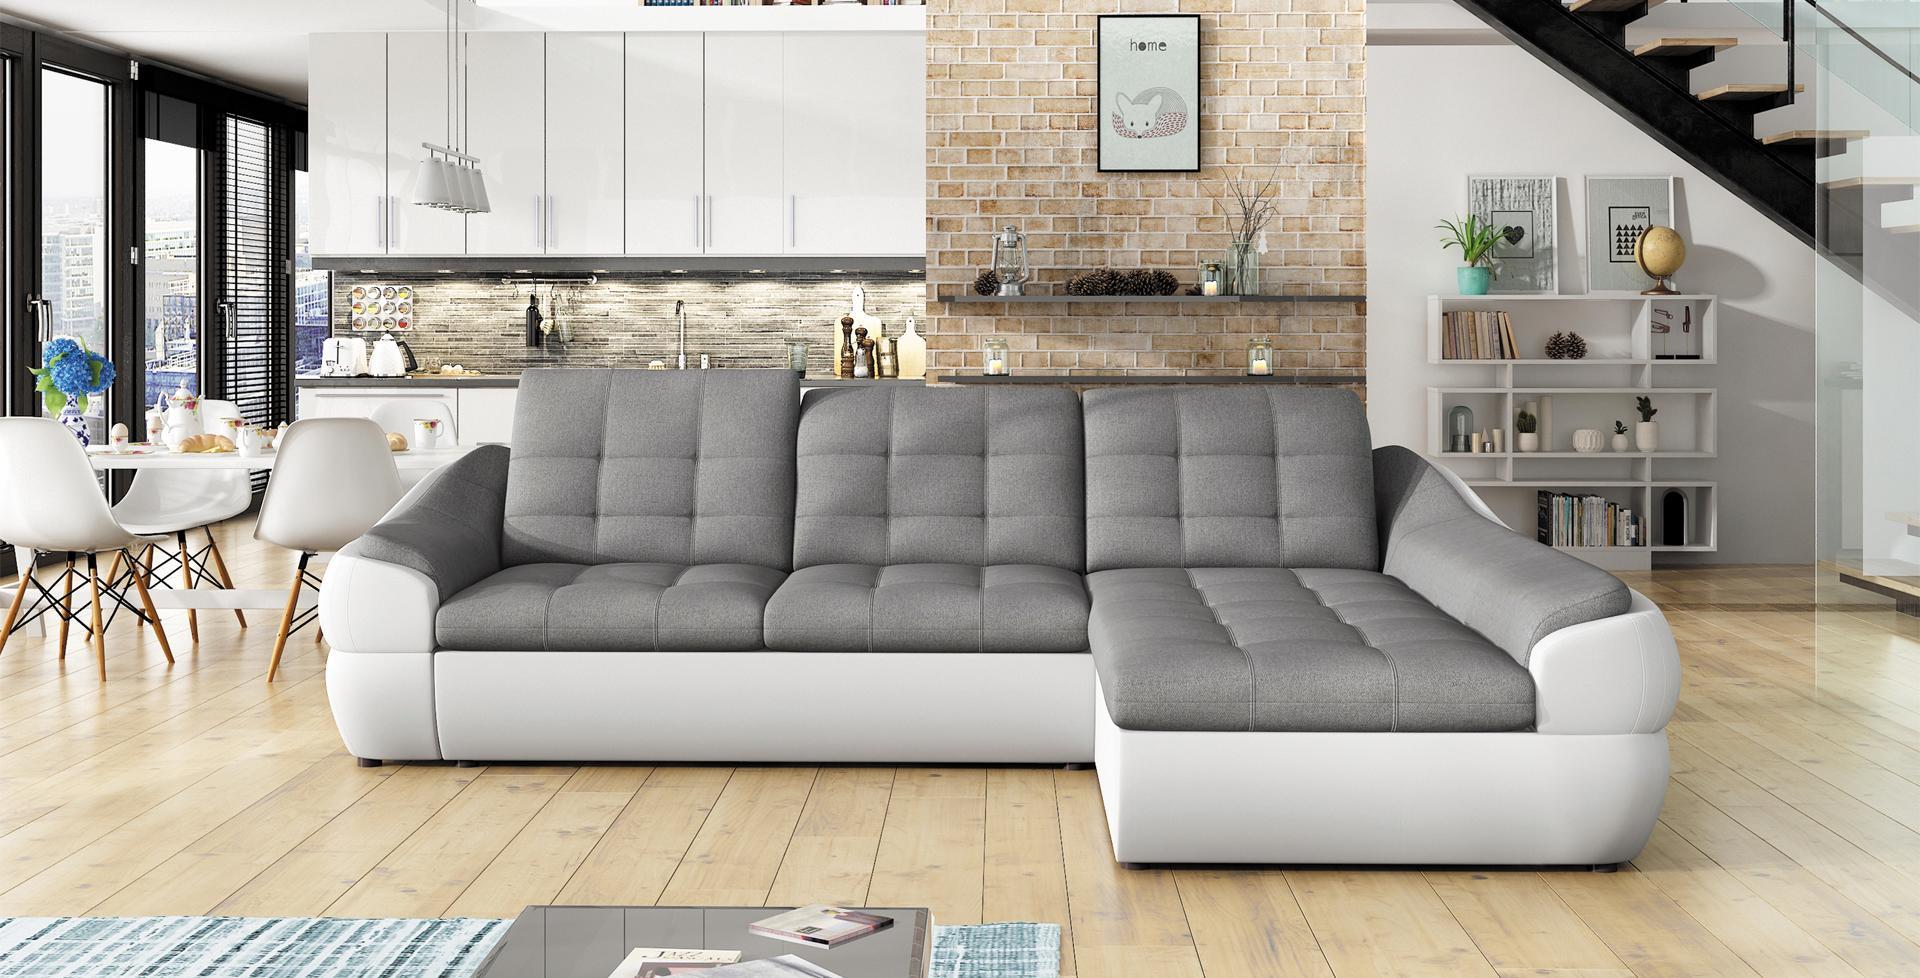 sofa schlafsofa designer sofa mit bettfunktion bettkasten ecksofa couch neu infinity mini